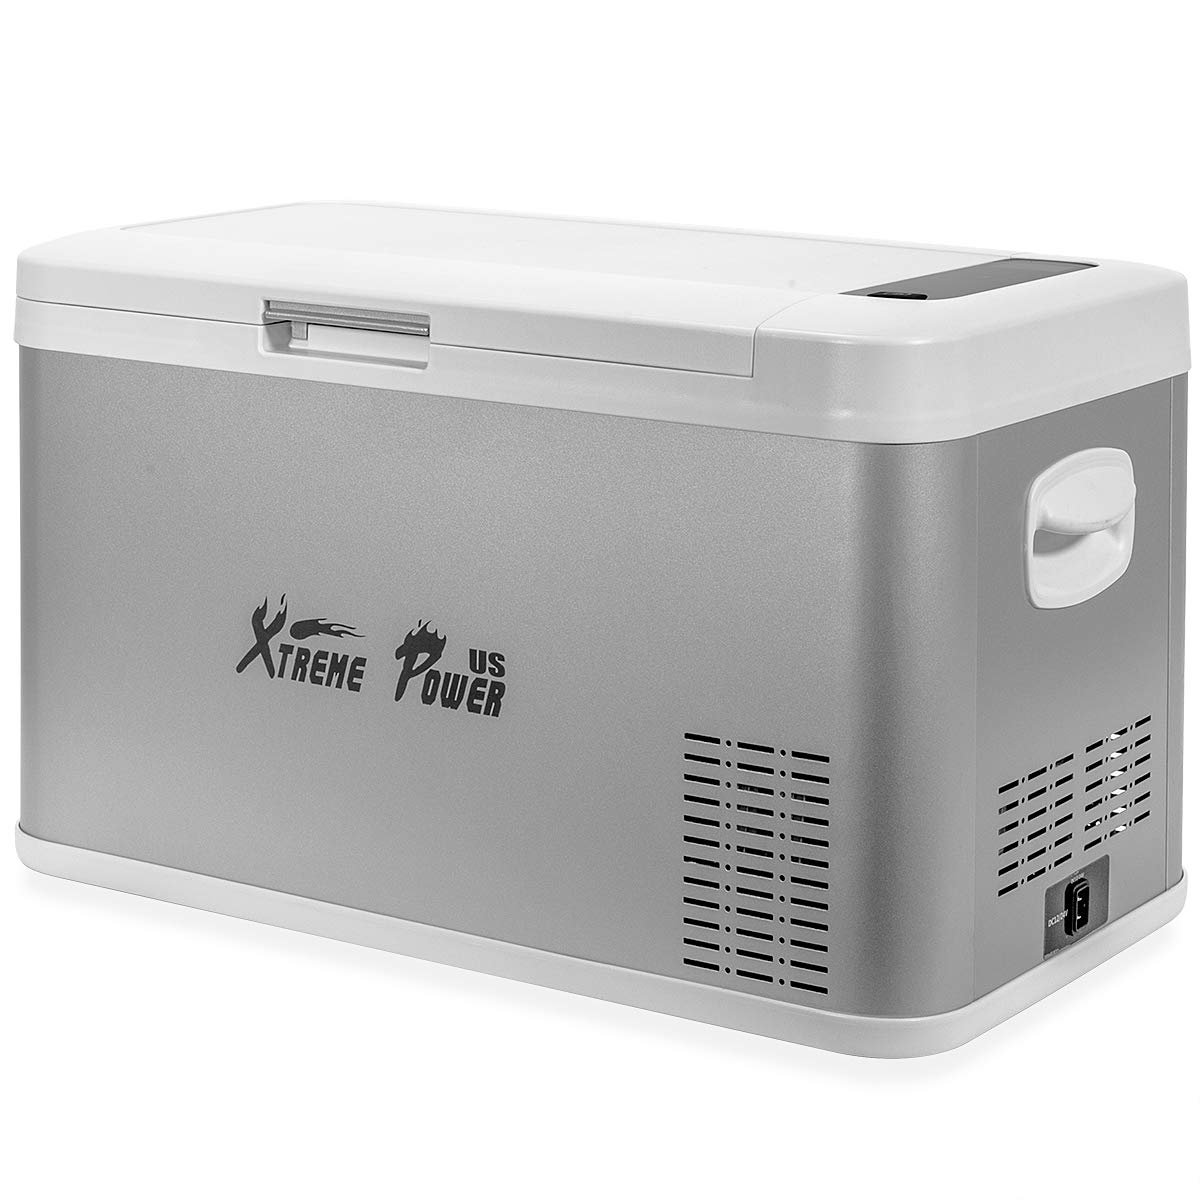 XtremepowerUS Portable Electric Cooler 26 Quart (Bluetooth Function) Refrigerator Adjustable Temperature Display Vehicle Car Mini Fridge ECO by XtremepowerUS (Image #1)